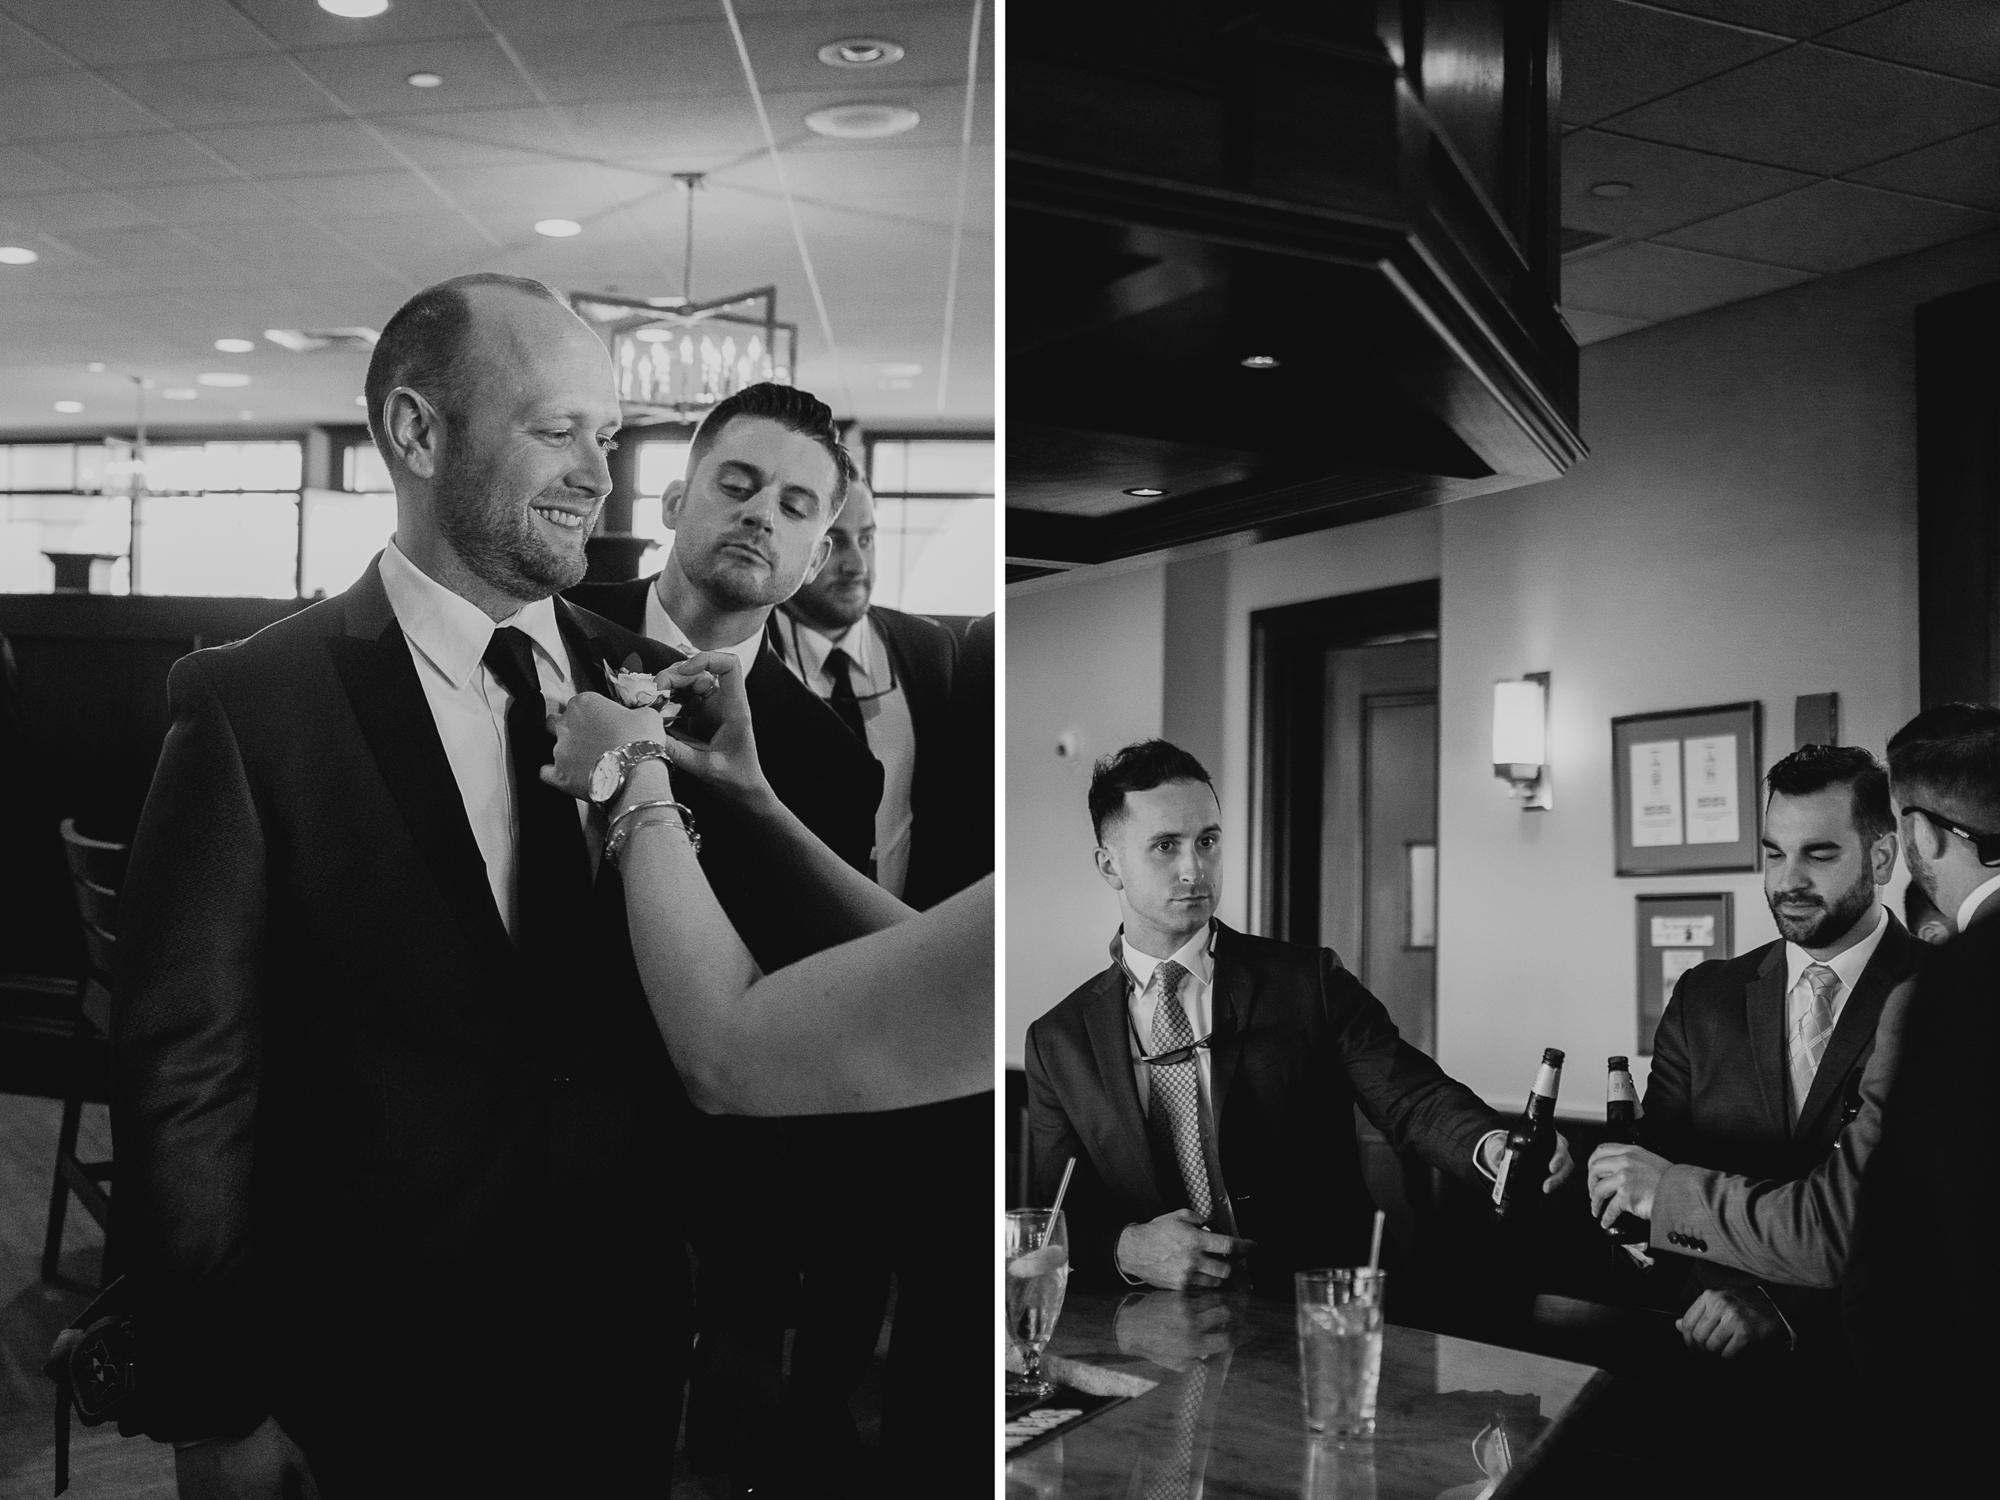 Jaclyn_Andrew_quincy_massachusetts_wedding002.jpg